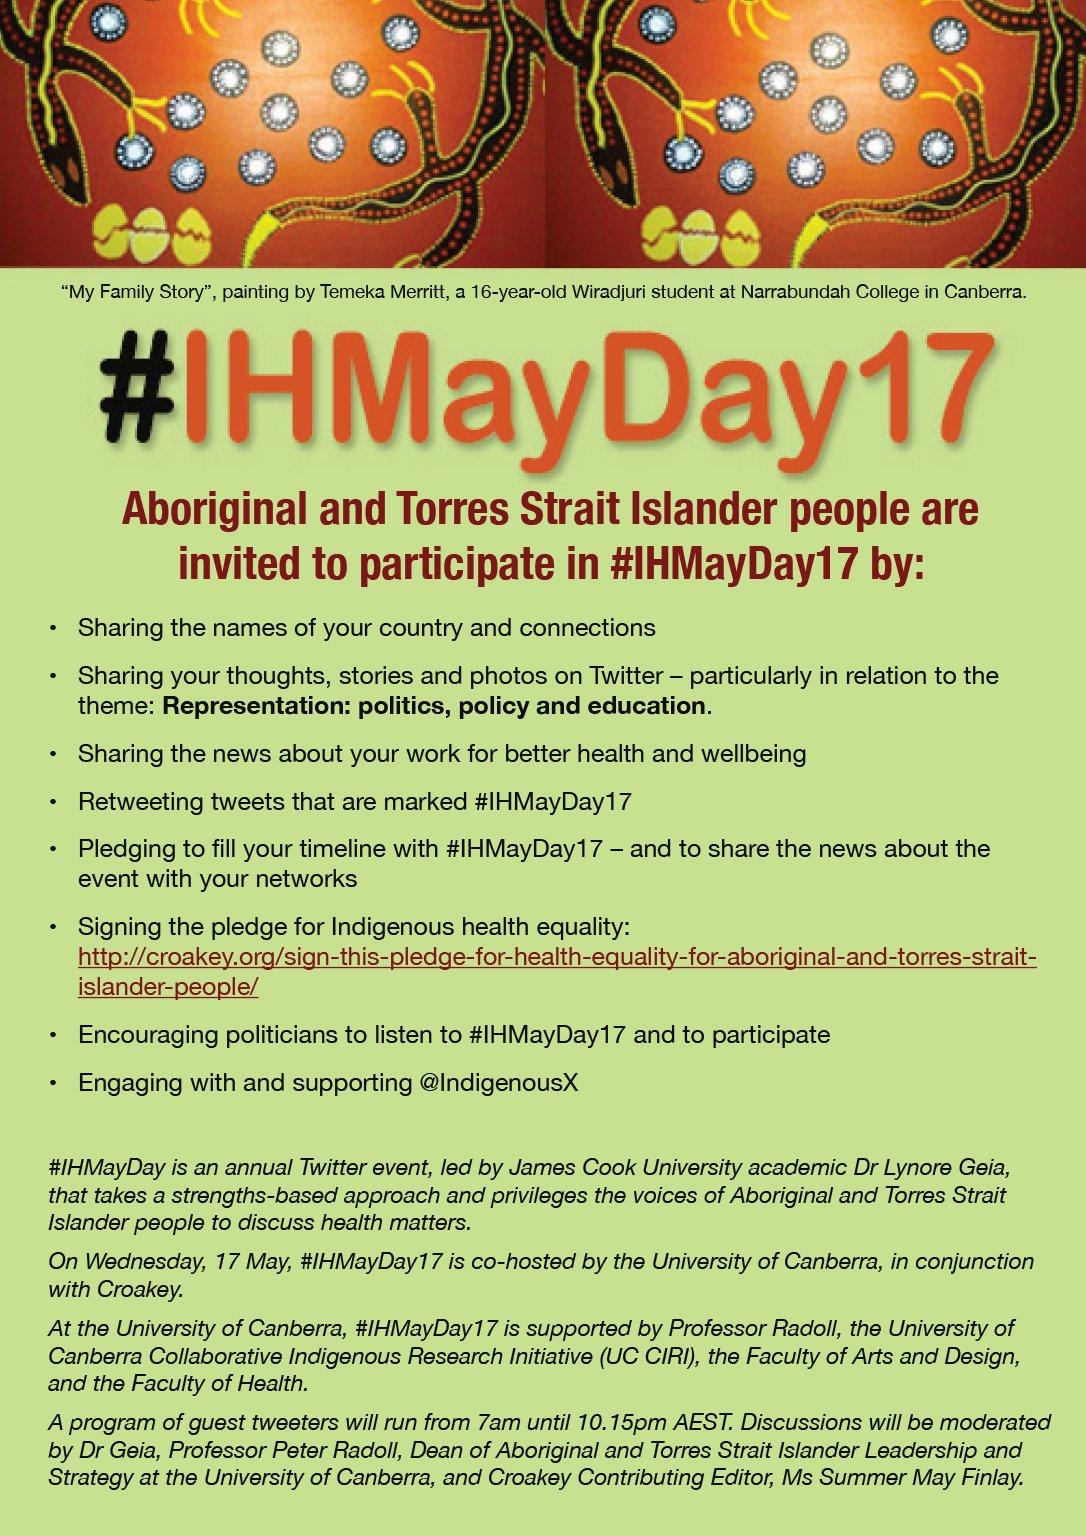 IHMayDay17_Tweeps